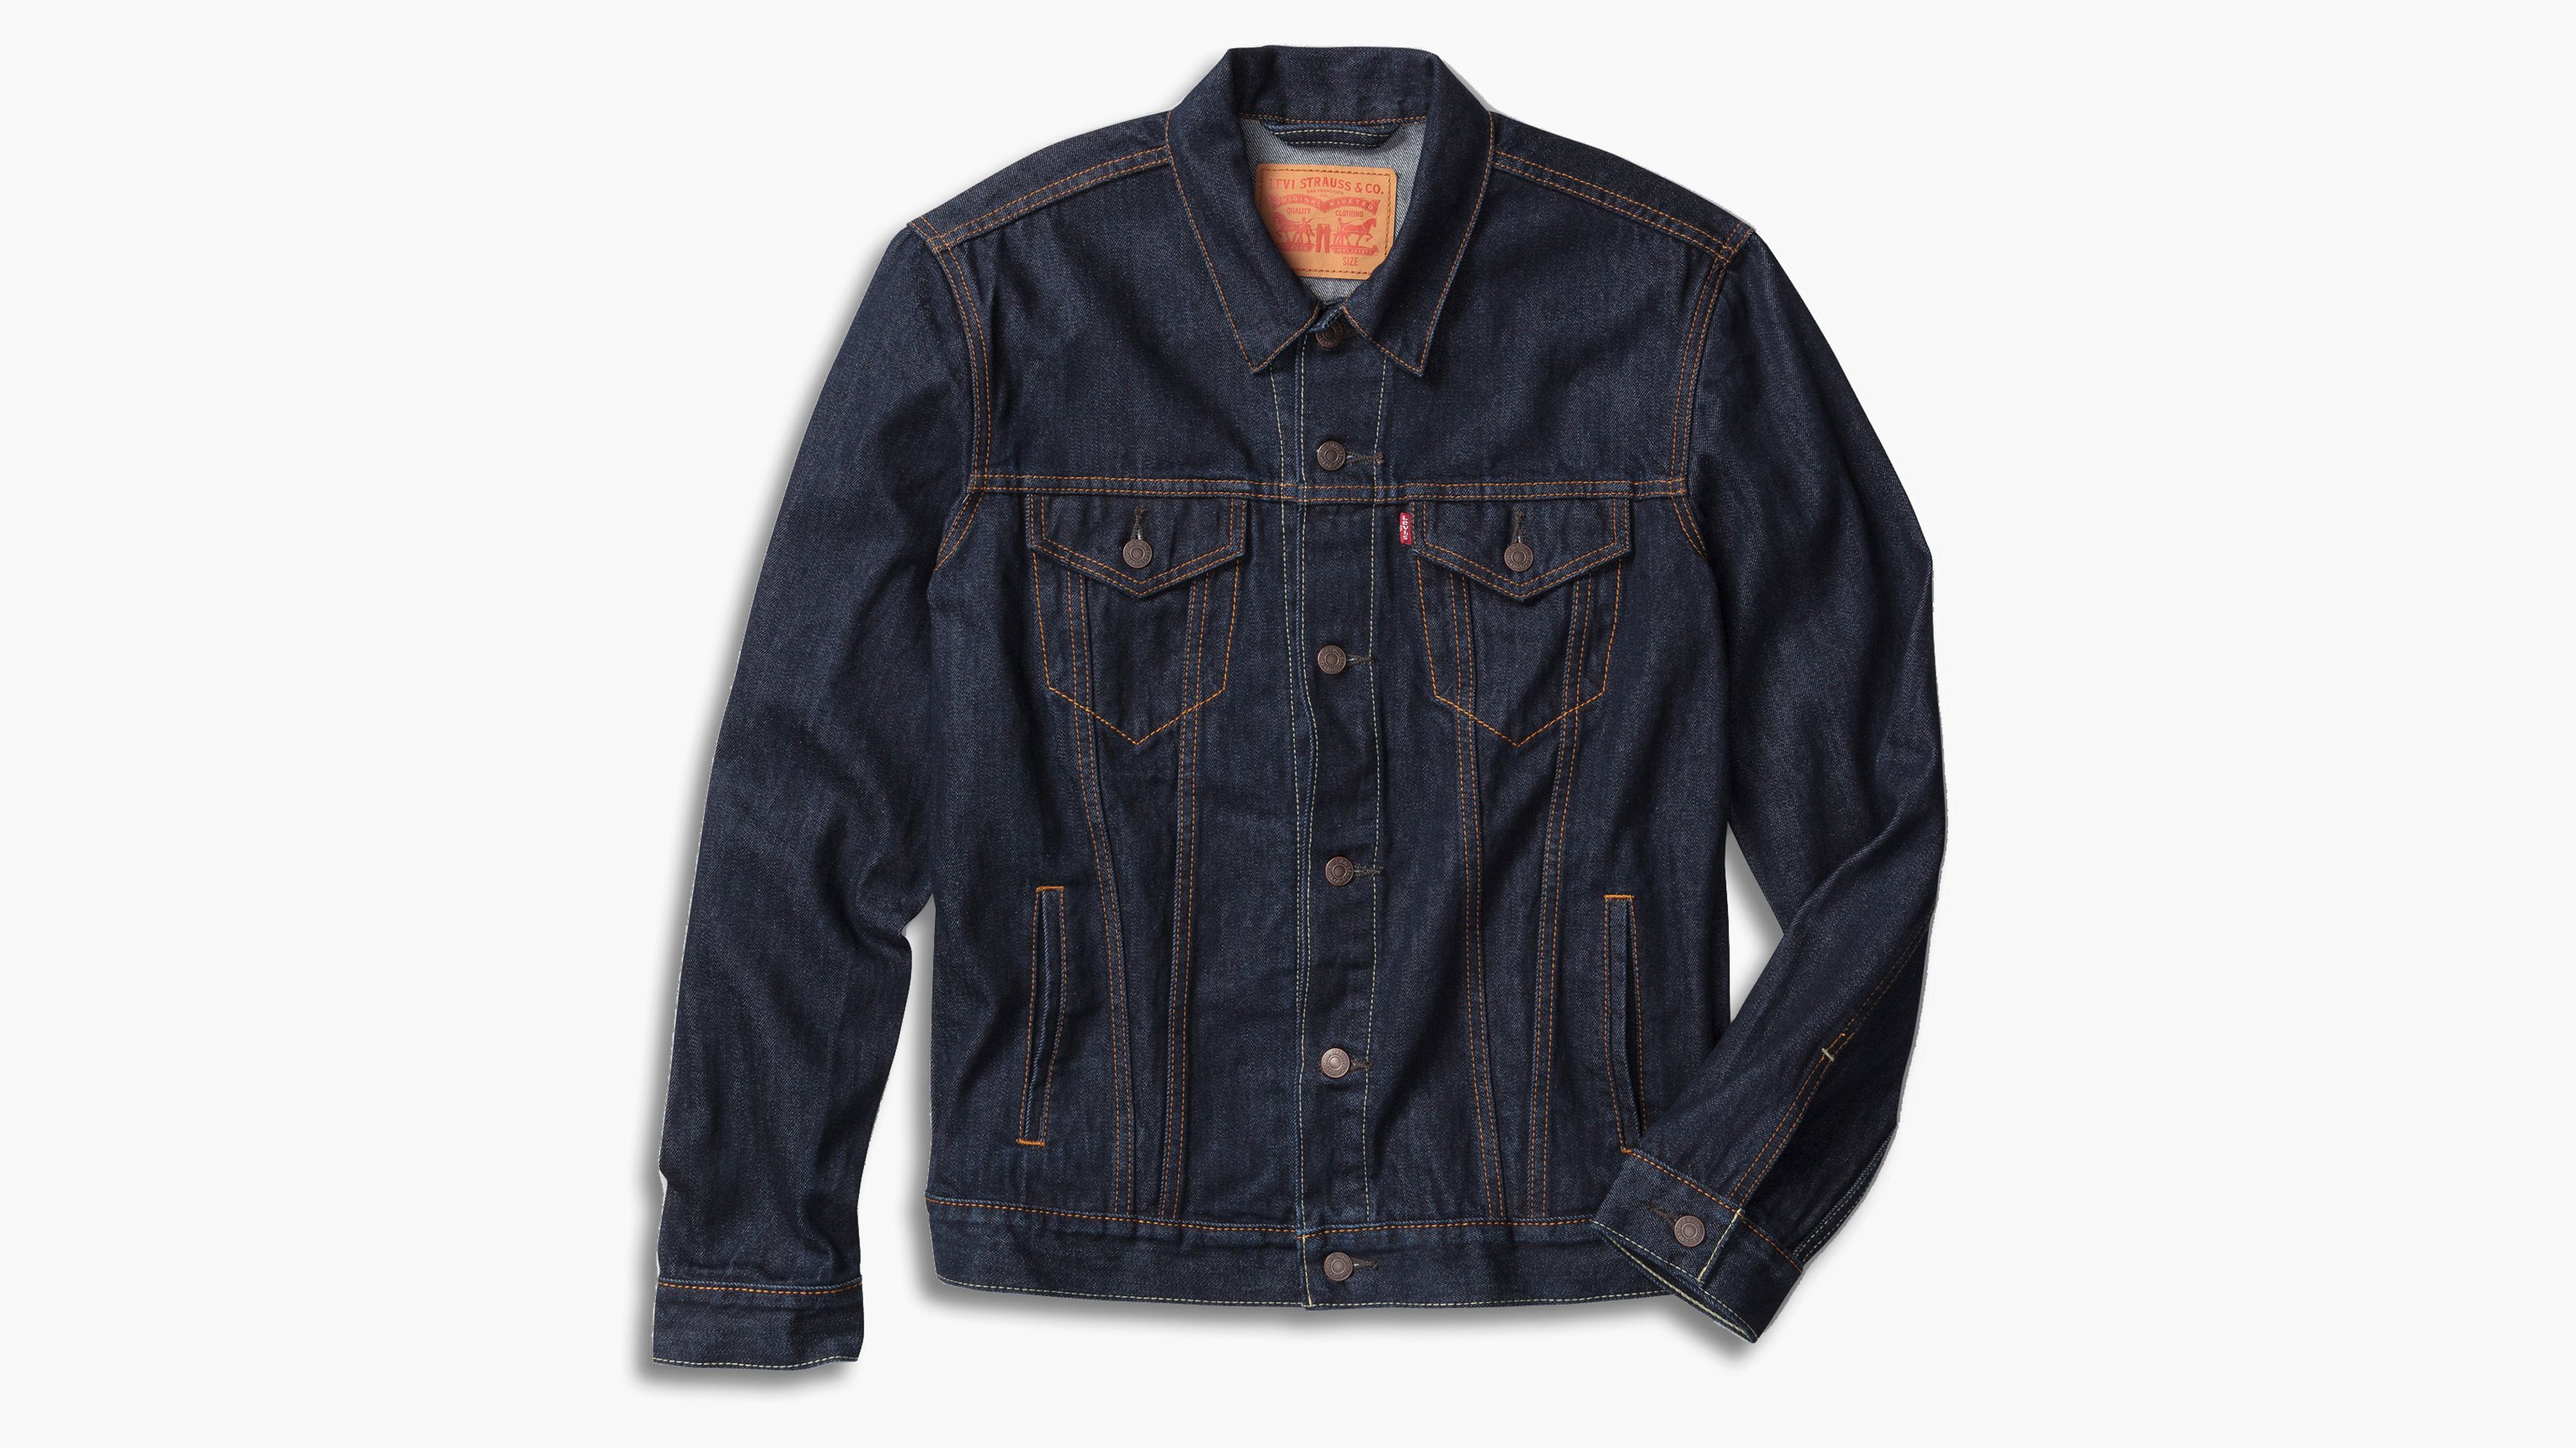 Levi's® Jeans, Jackets & Clothing